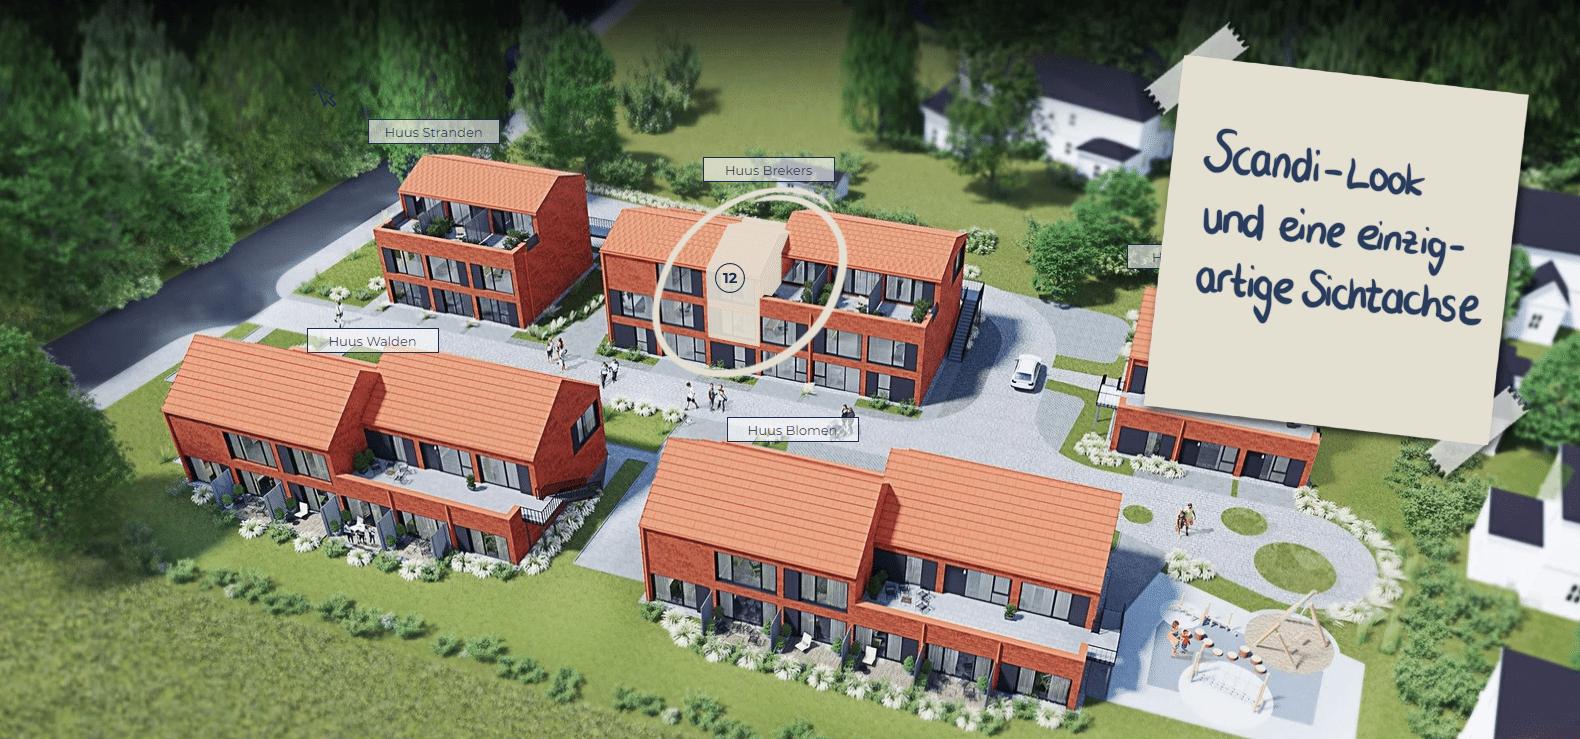 12_De ole School - Ostseeurlaub Ferienapartments Hohwacht Nähe Heiligenhafen Lütjenburg Kieler Bucht